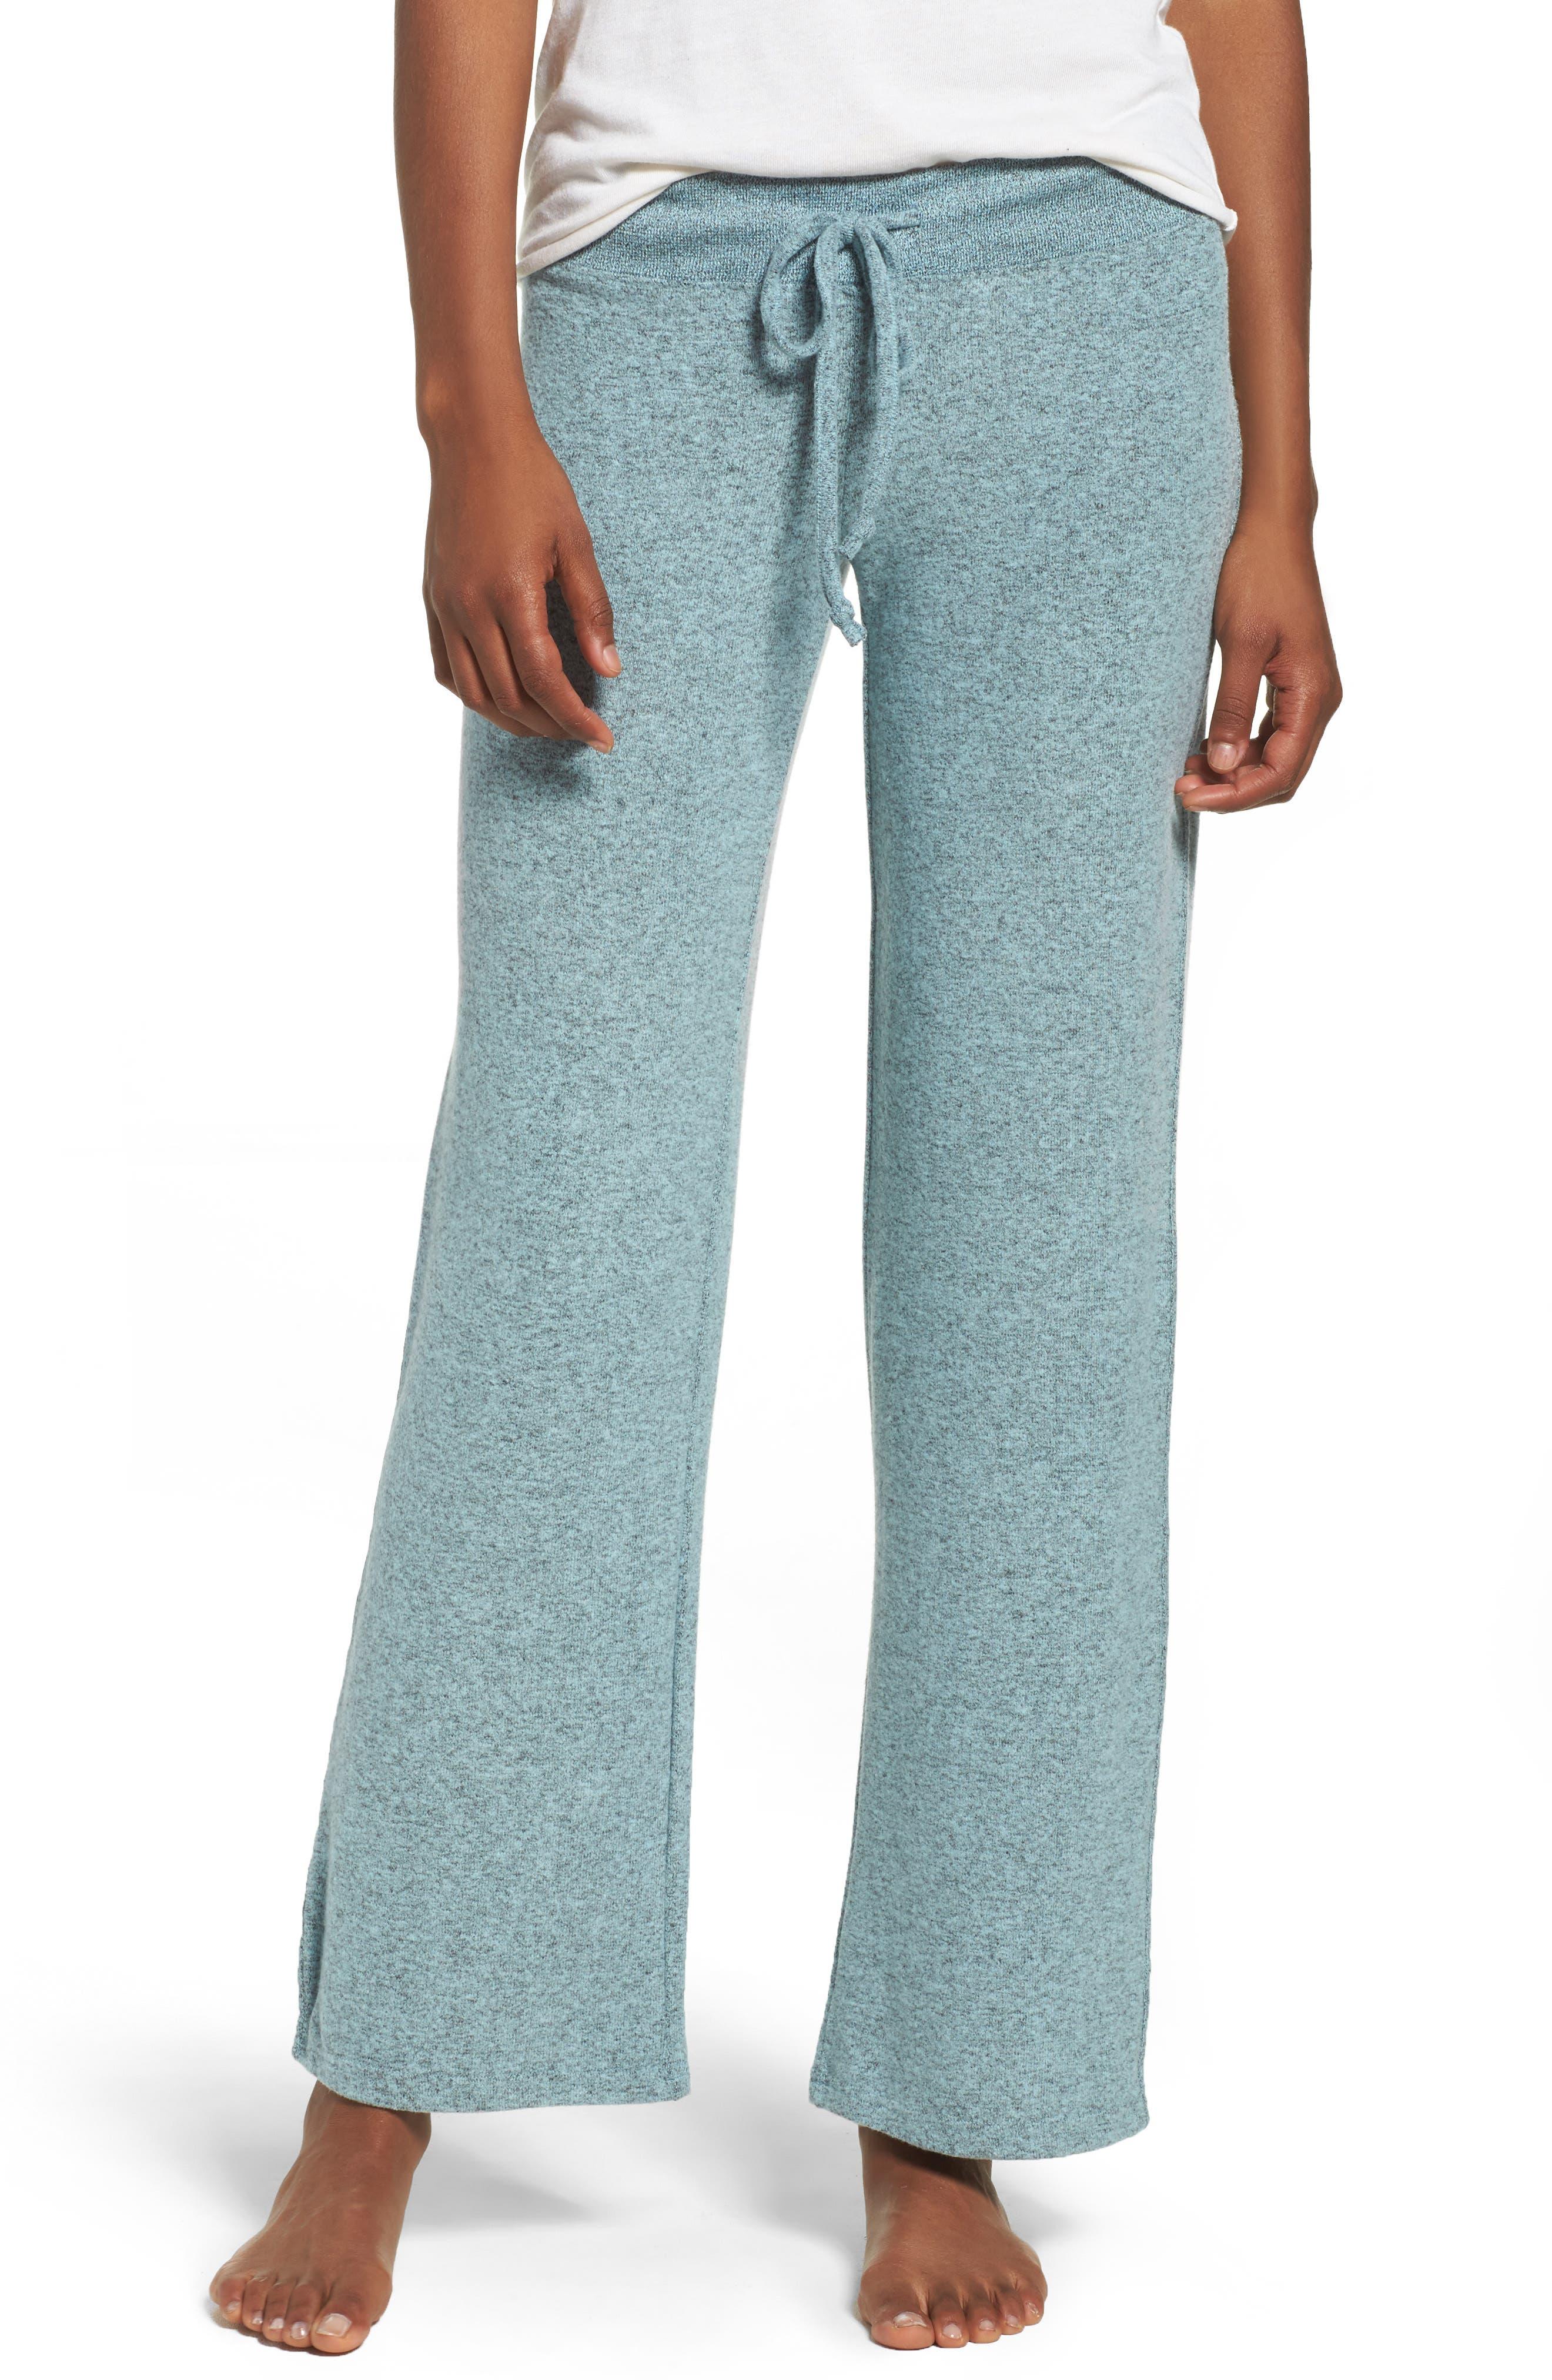 Main Image - Make + Model 'Best Boyfriend' Brushed Hacci Lounge Pants